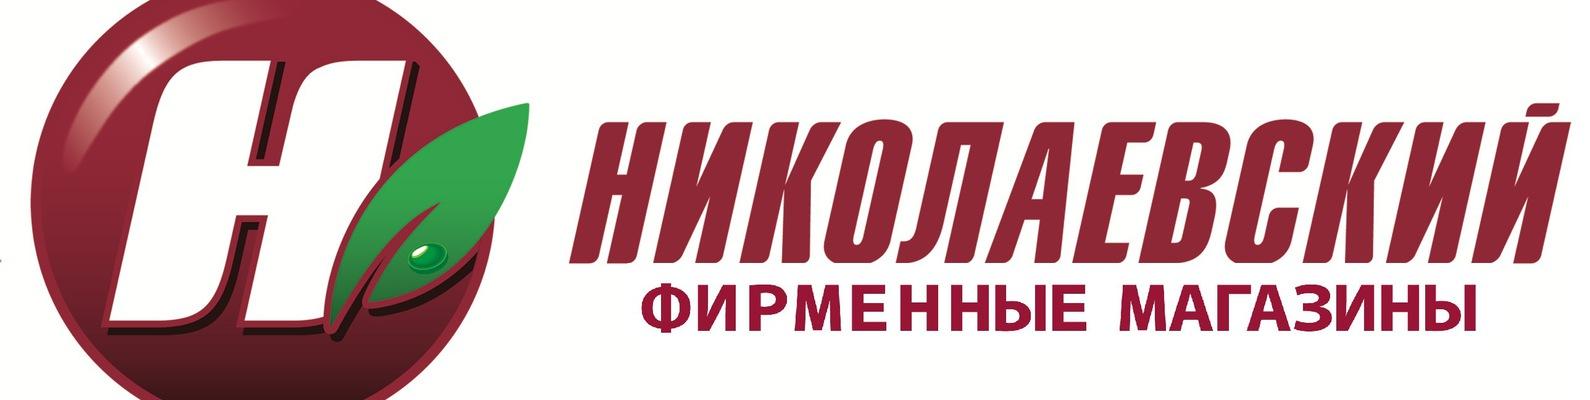 Дробышевский александр владимирович